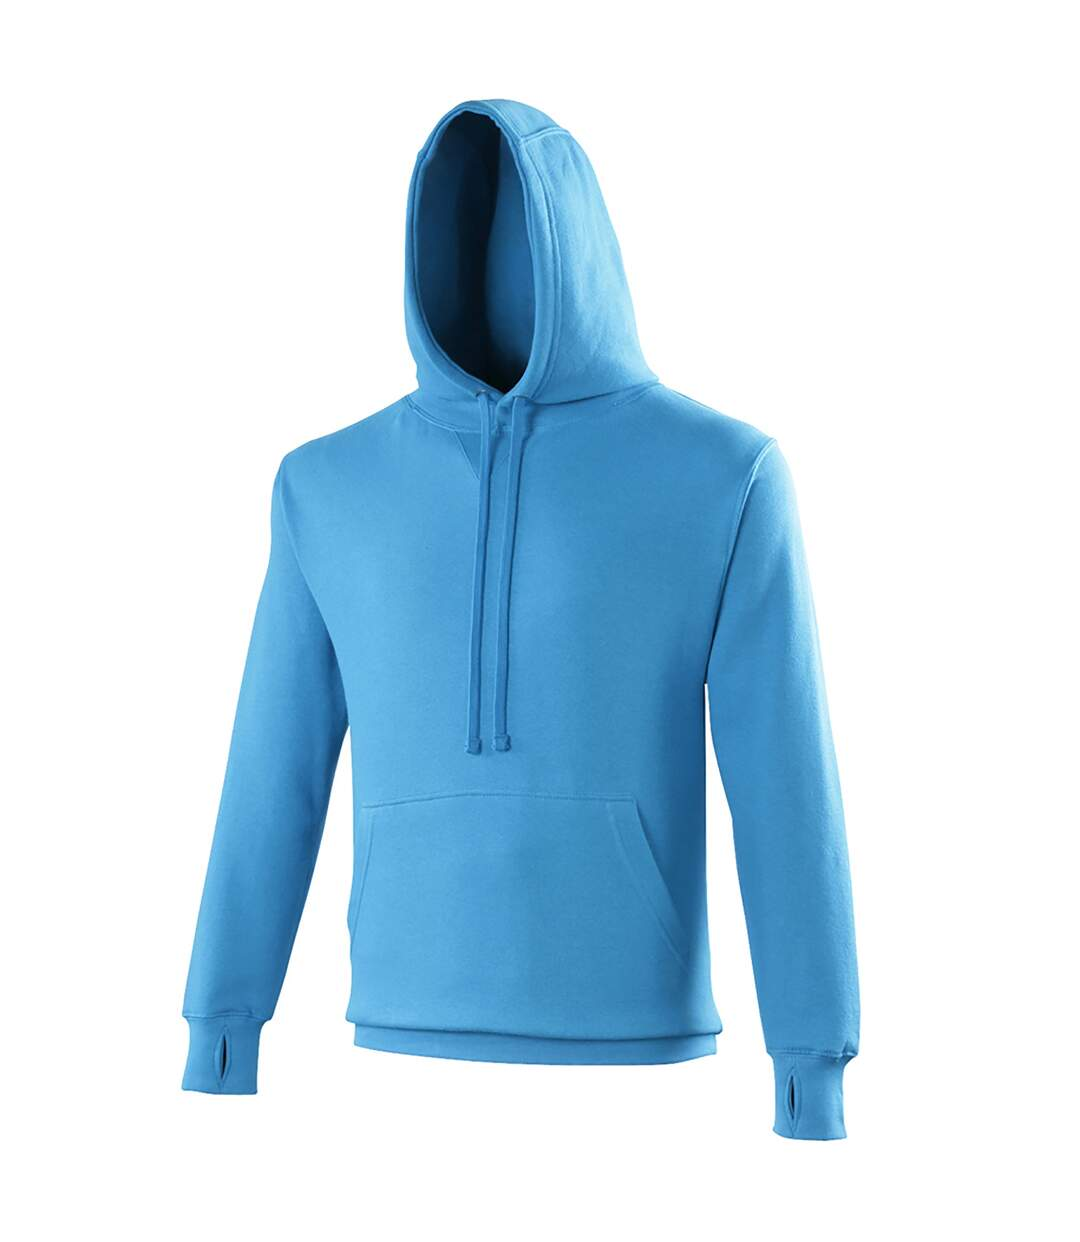 Awdis - Sweatshirt À Capuche - Homme (Rose) - UTRW170